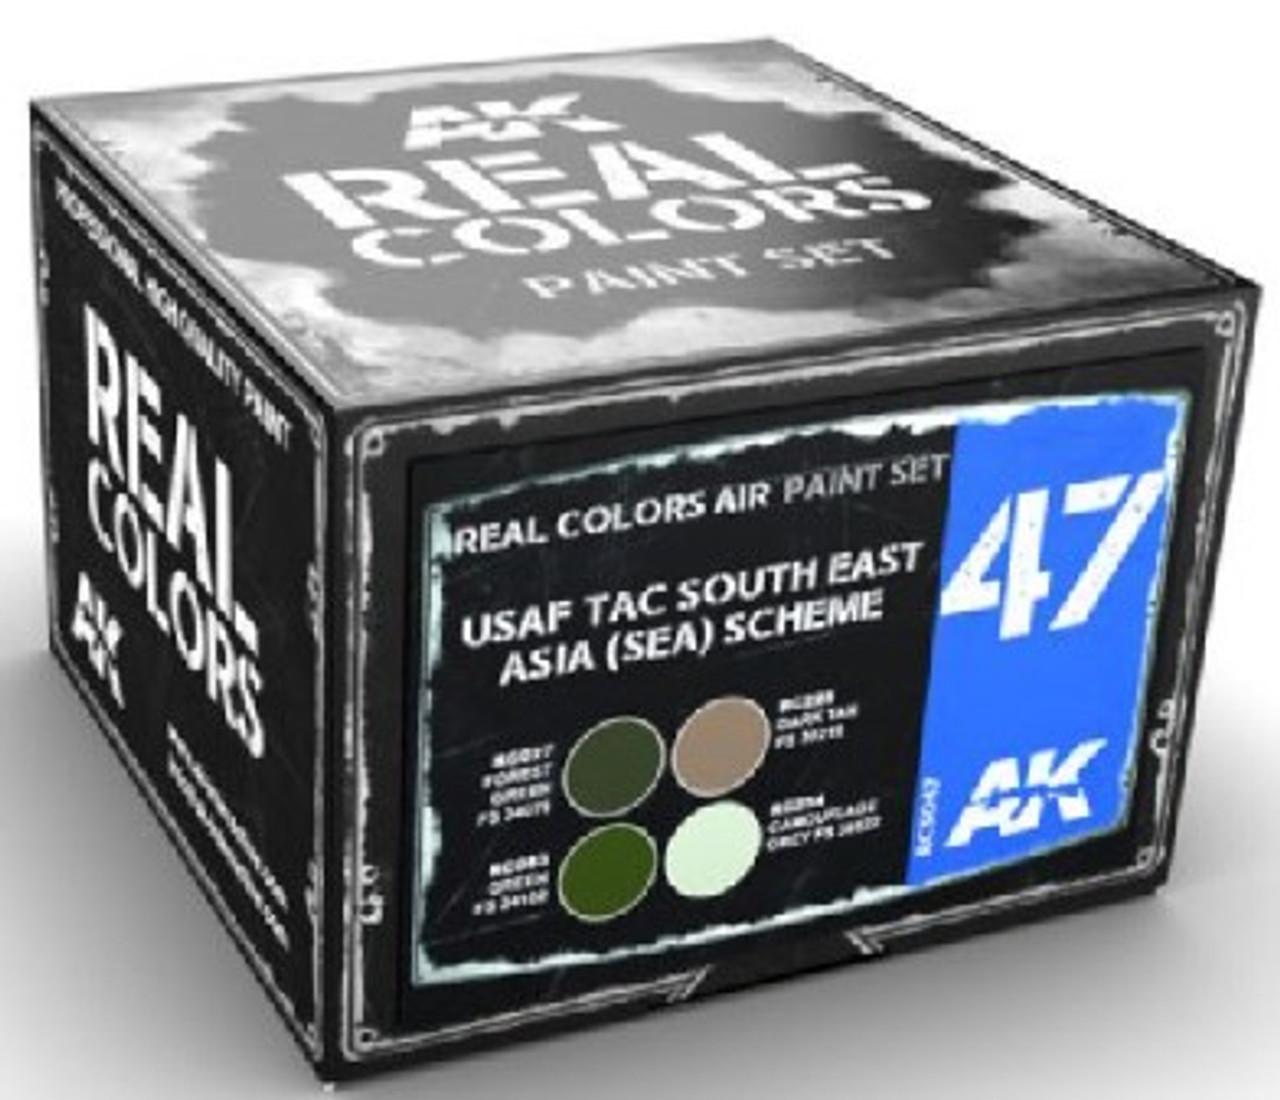 Real Colors: USAF TAC South East Asia (SEA) Scheme Acrylic